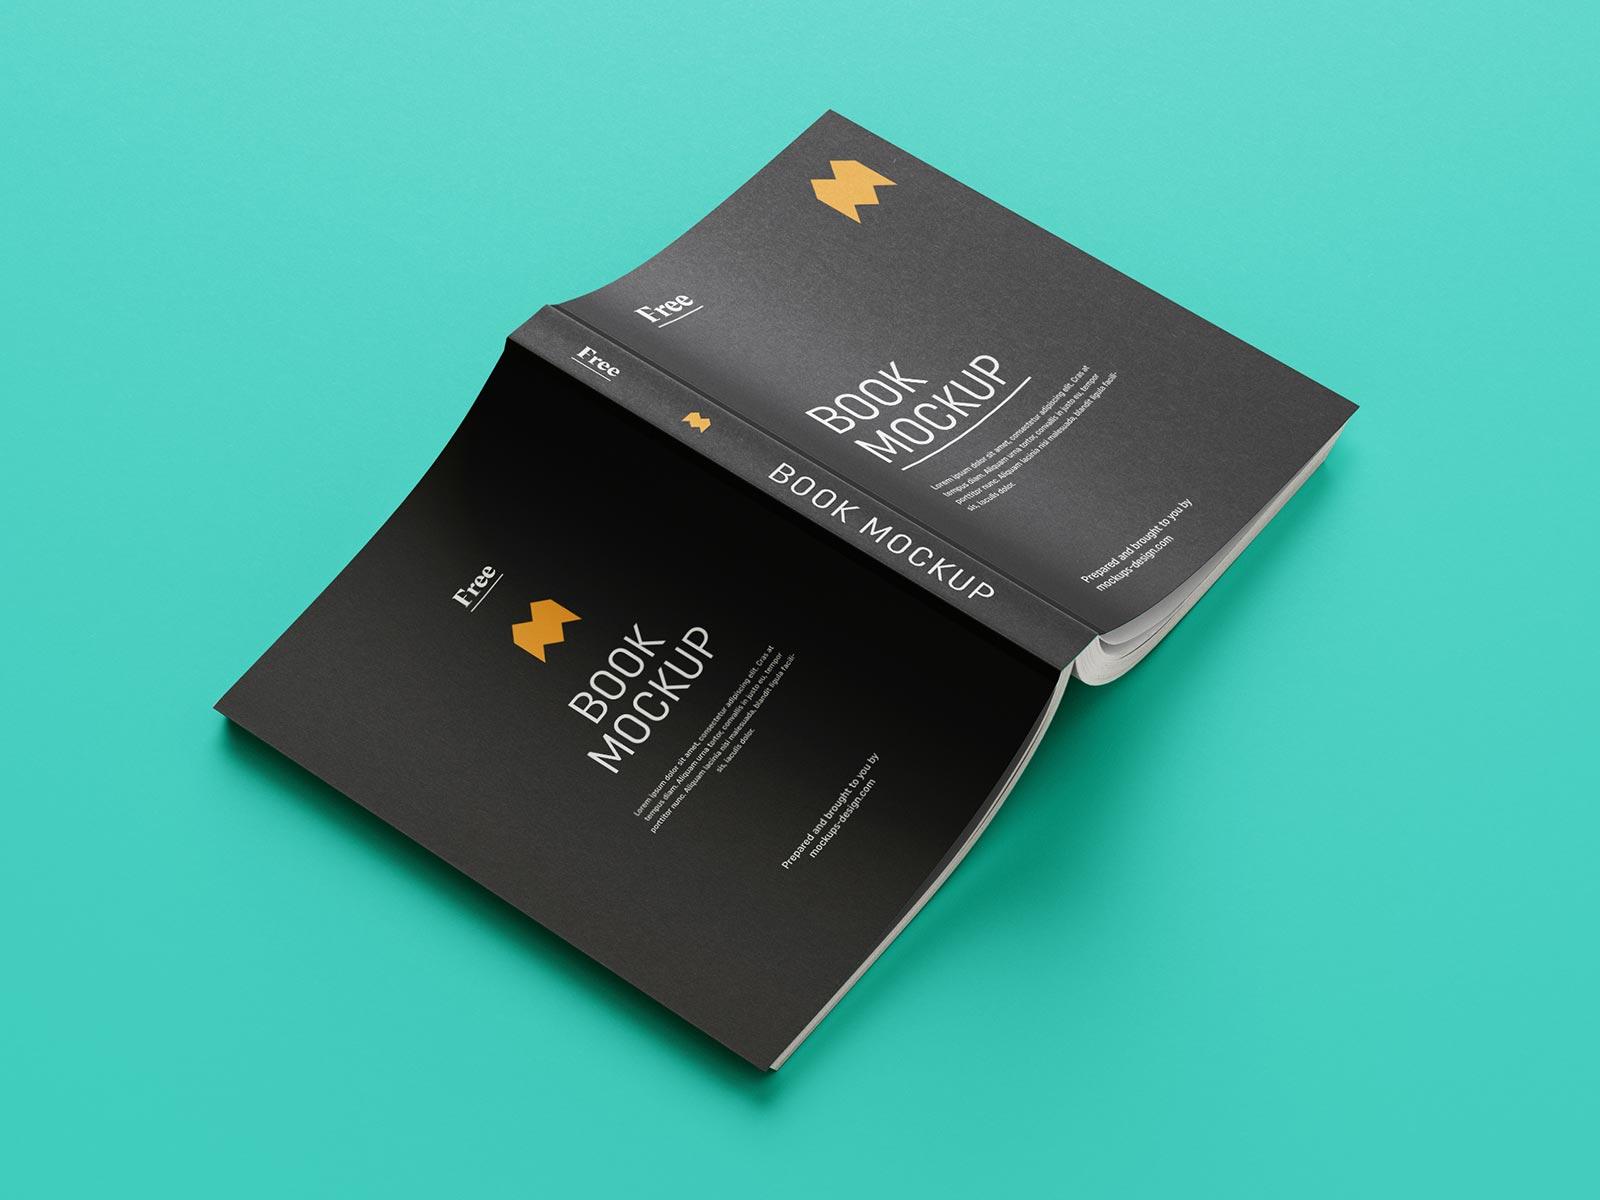 Free Paperback Book Mockup PSD Set (8 PSD Renders) (1)